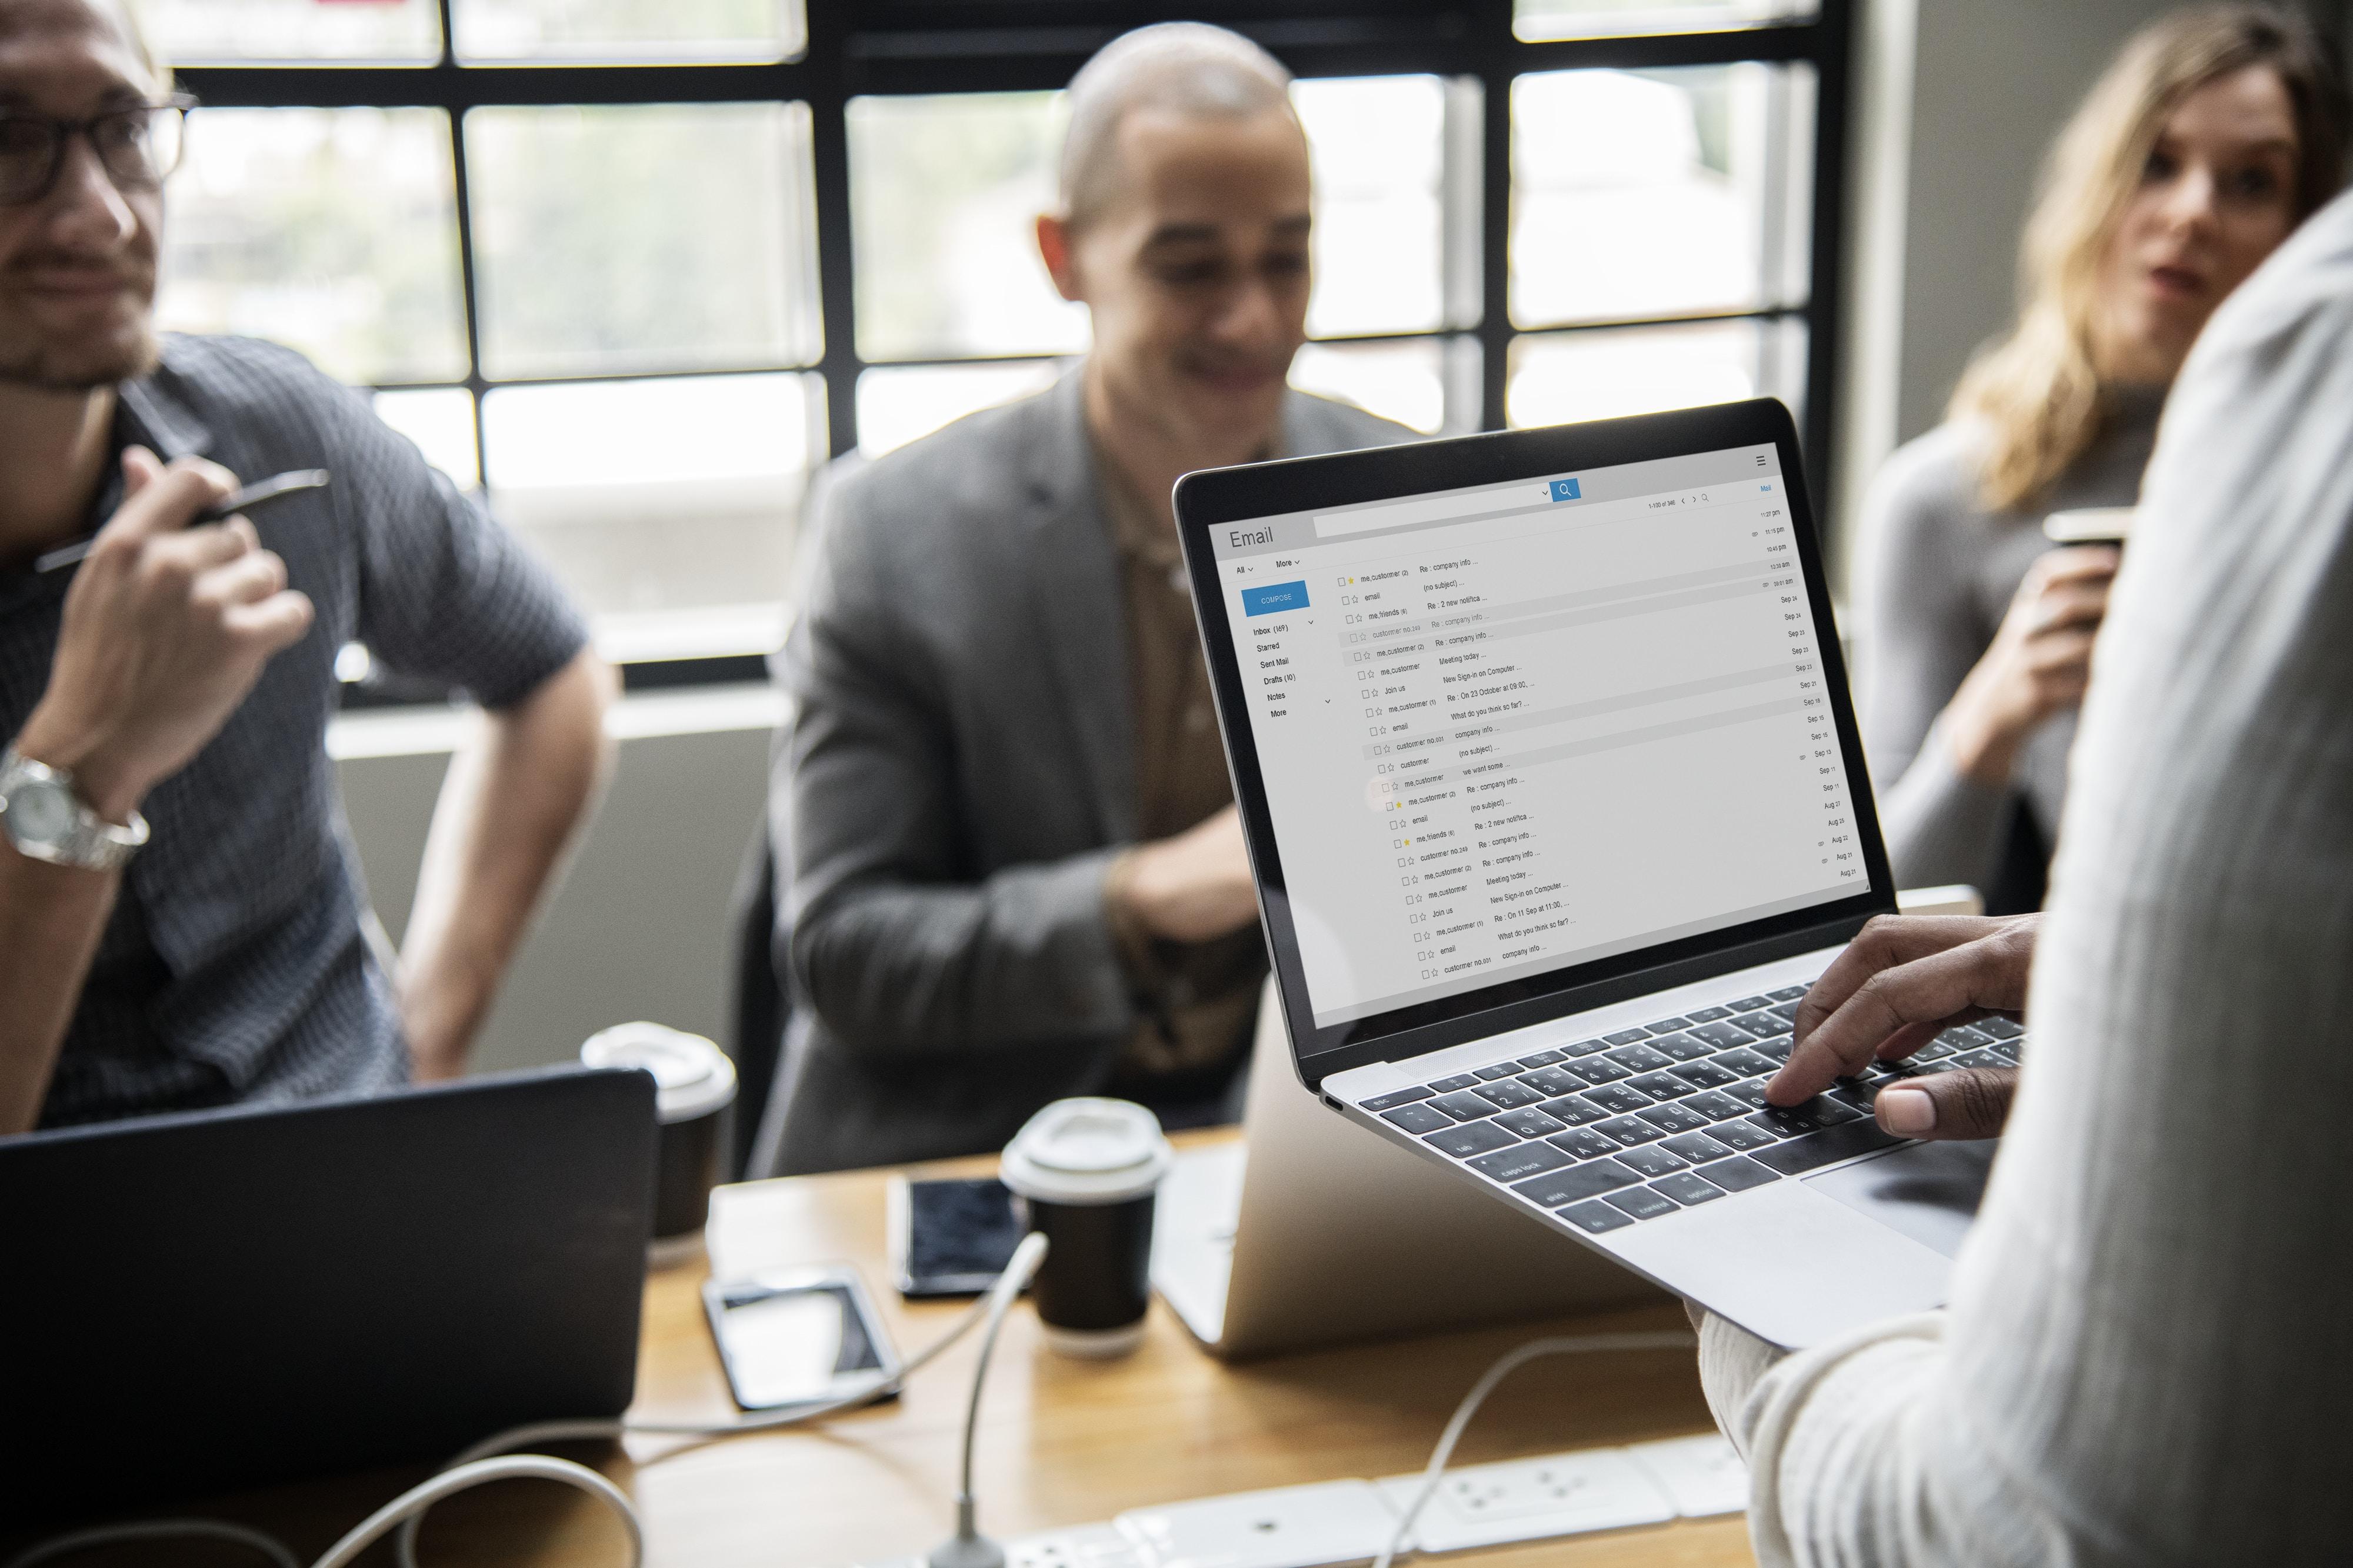 group of people having meeting using laptop computers